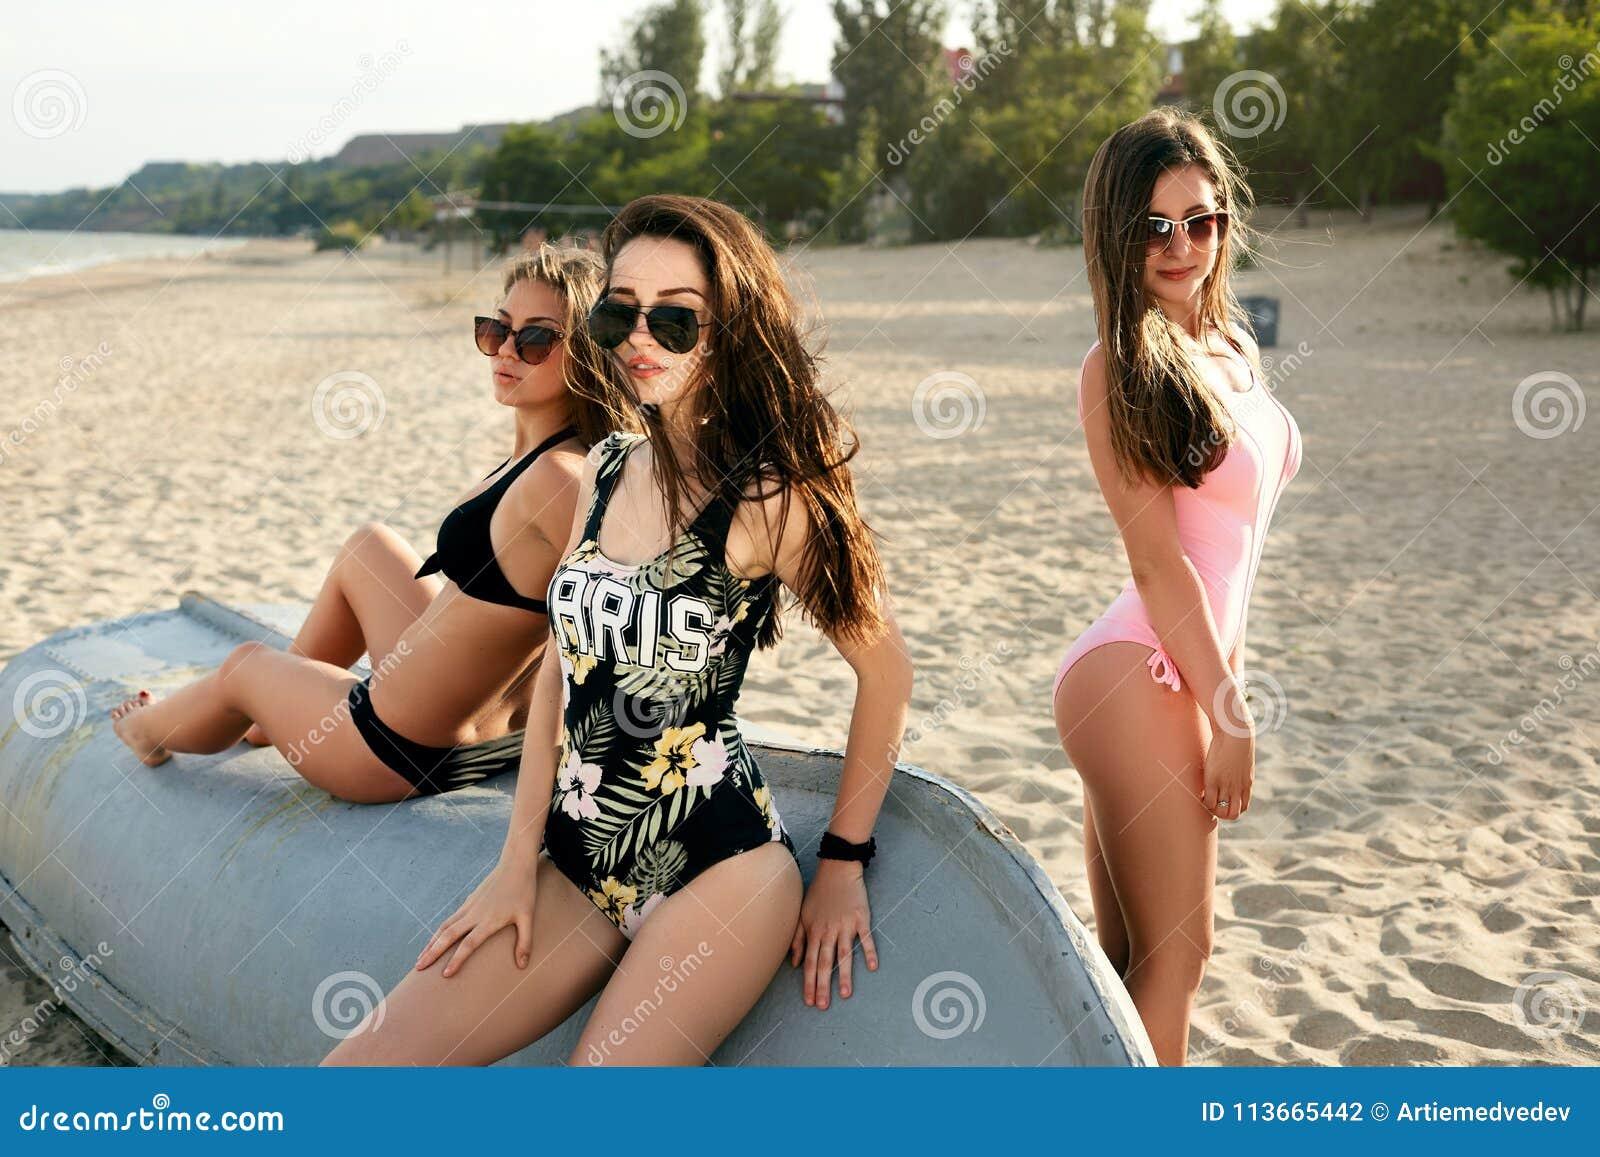 Beach Models Stock Photos - Download 3,019 Royalty Free Photos